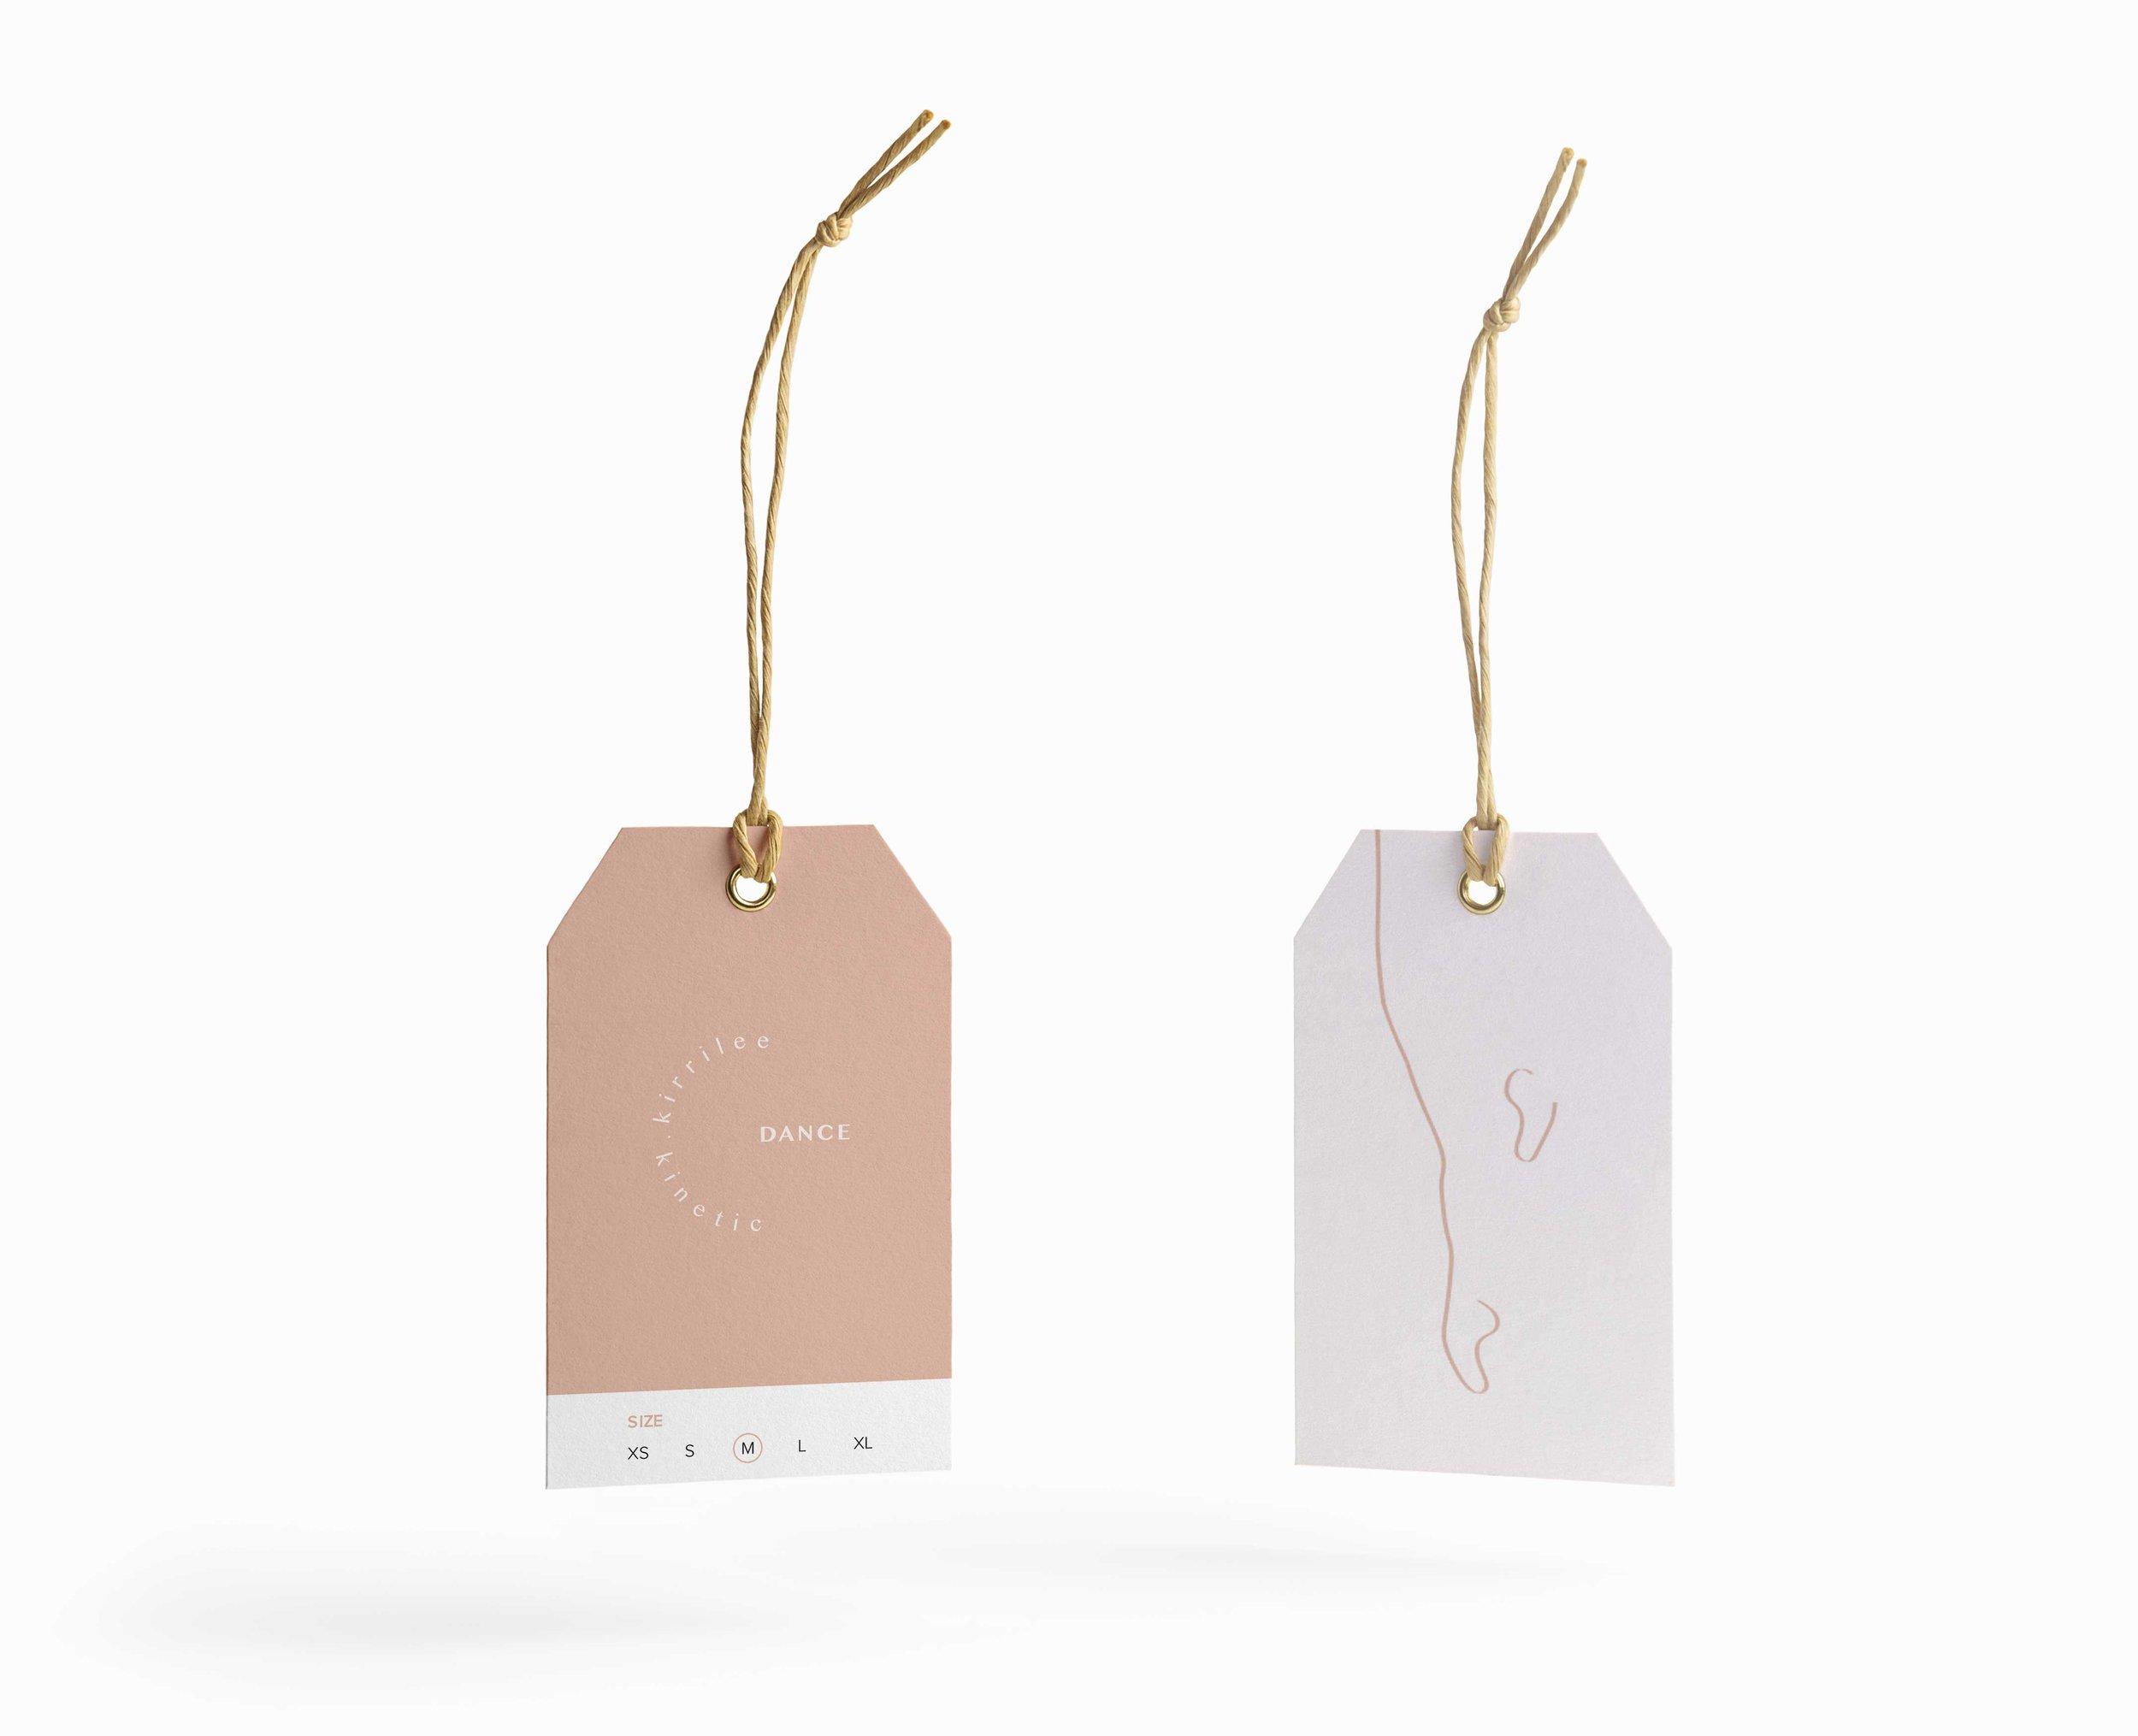 KKD-Custom-Swing-tags-fashion-design.JPG